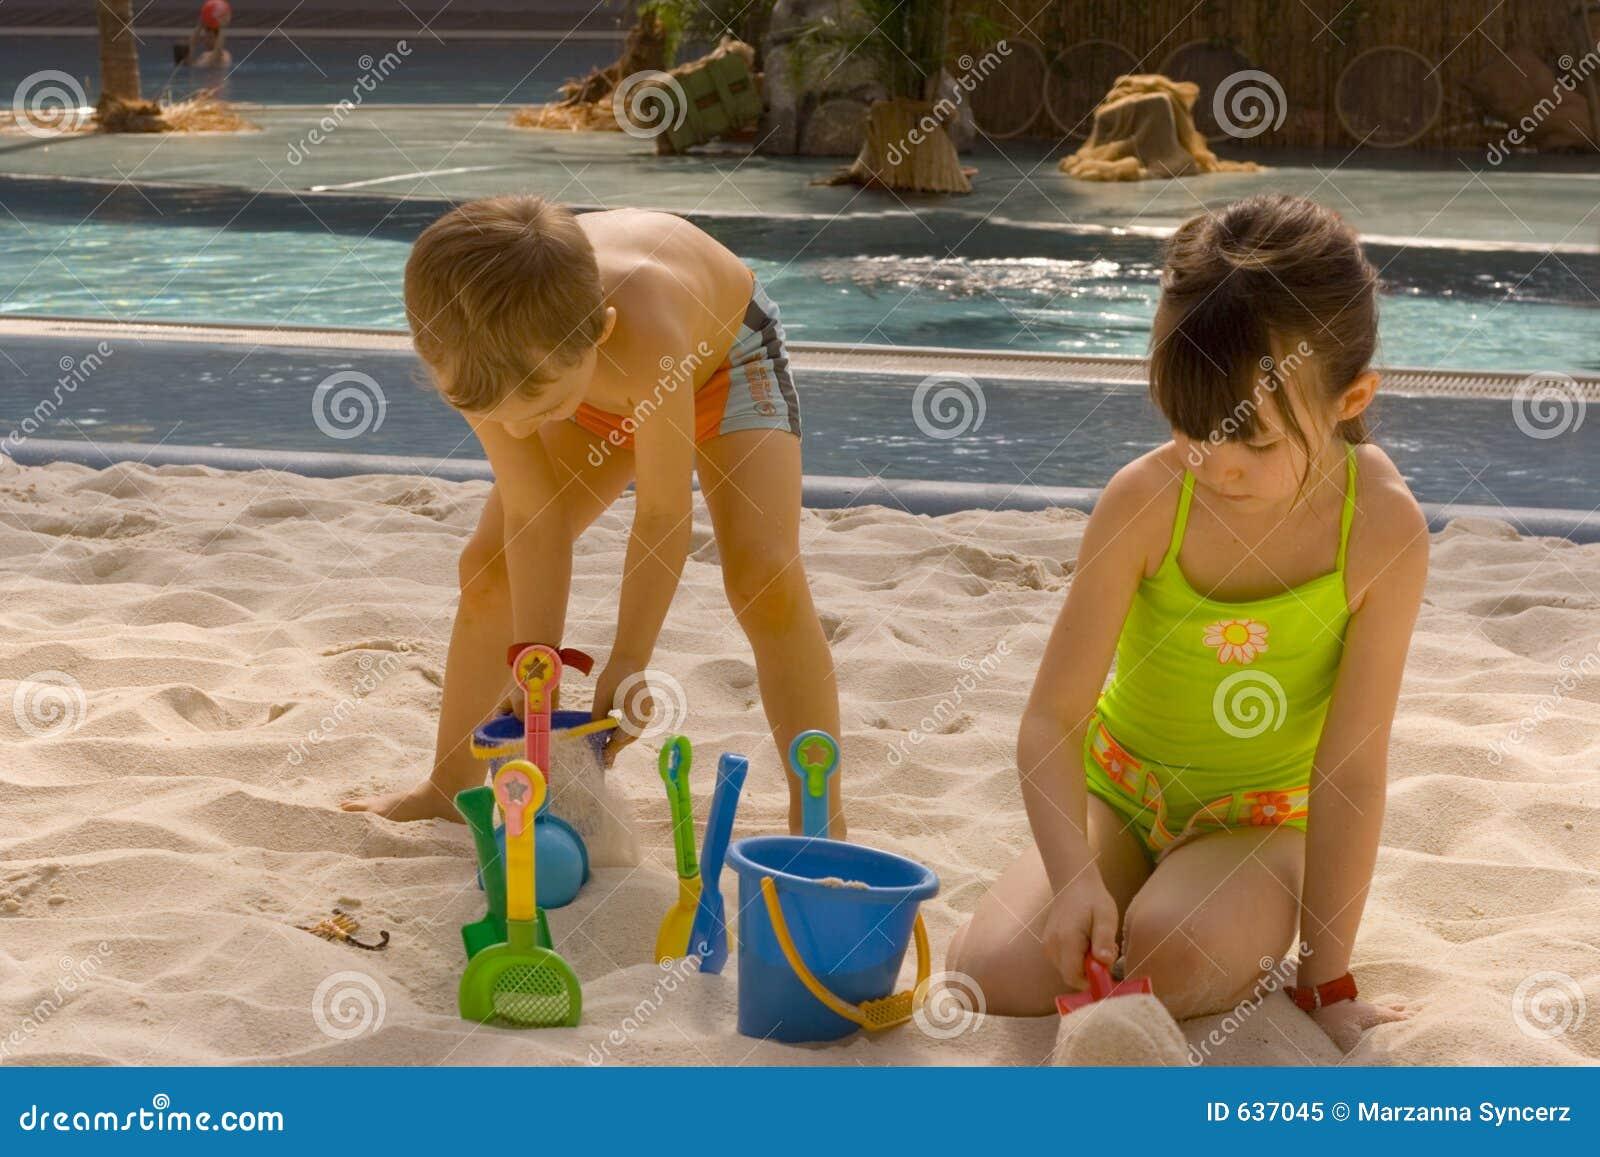 children play in sand stock image image of boys child. Black Bedroom Furniture Sets. Home Design Ideas